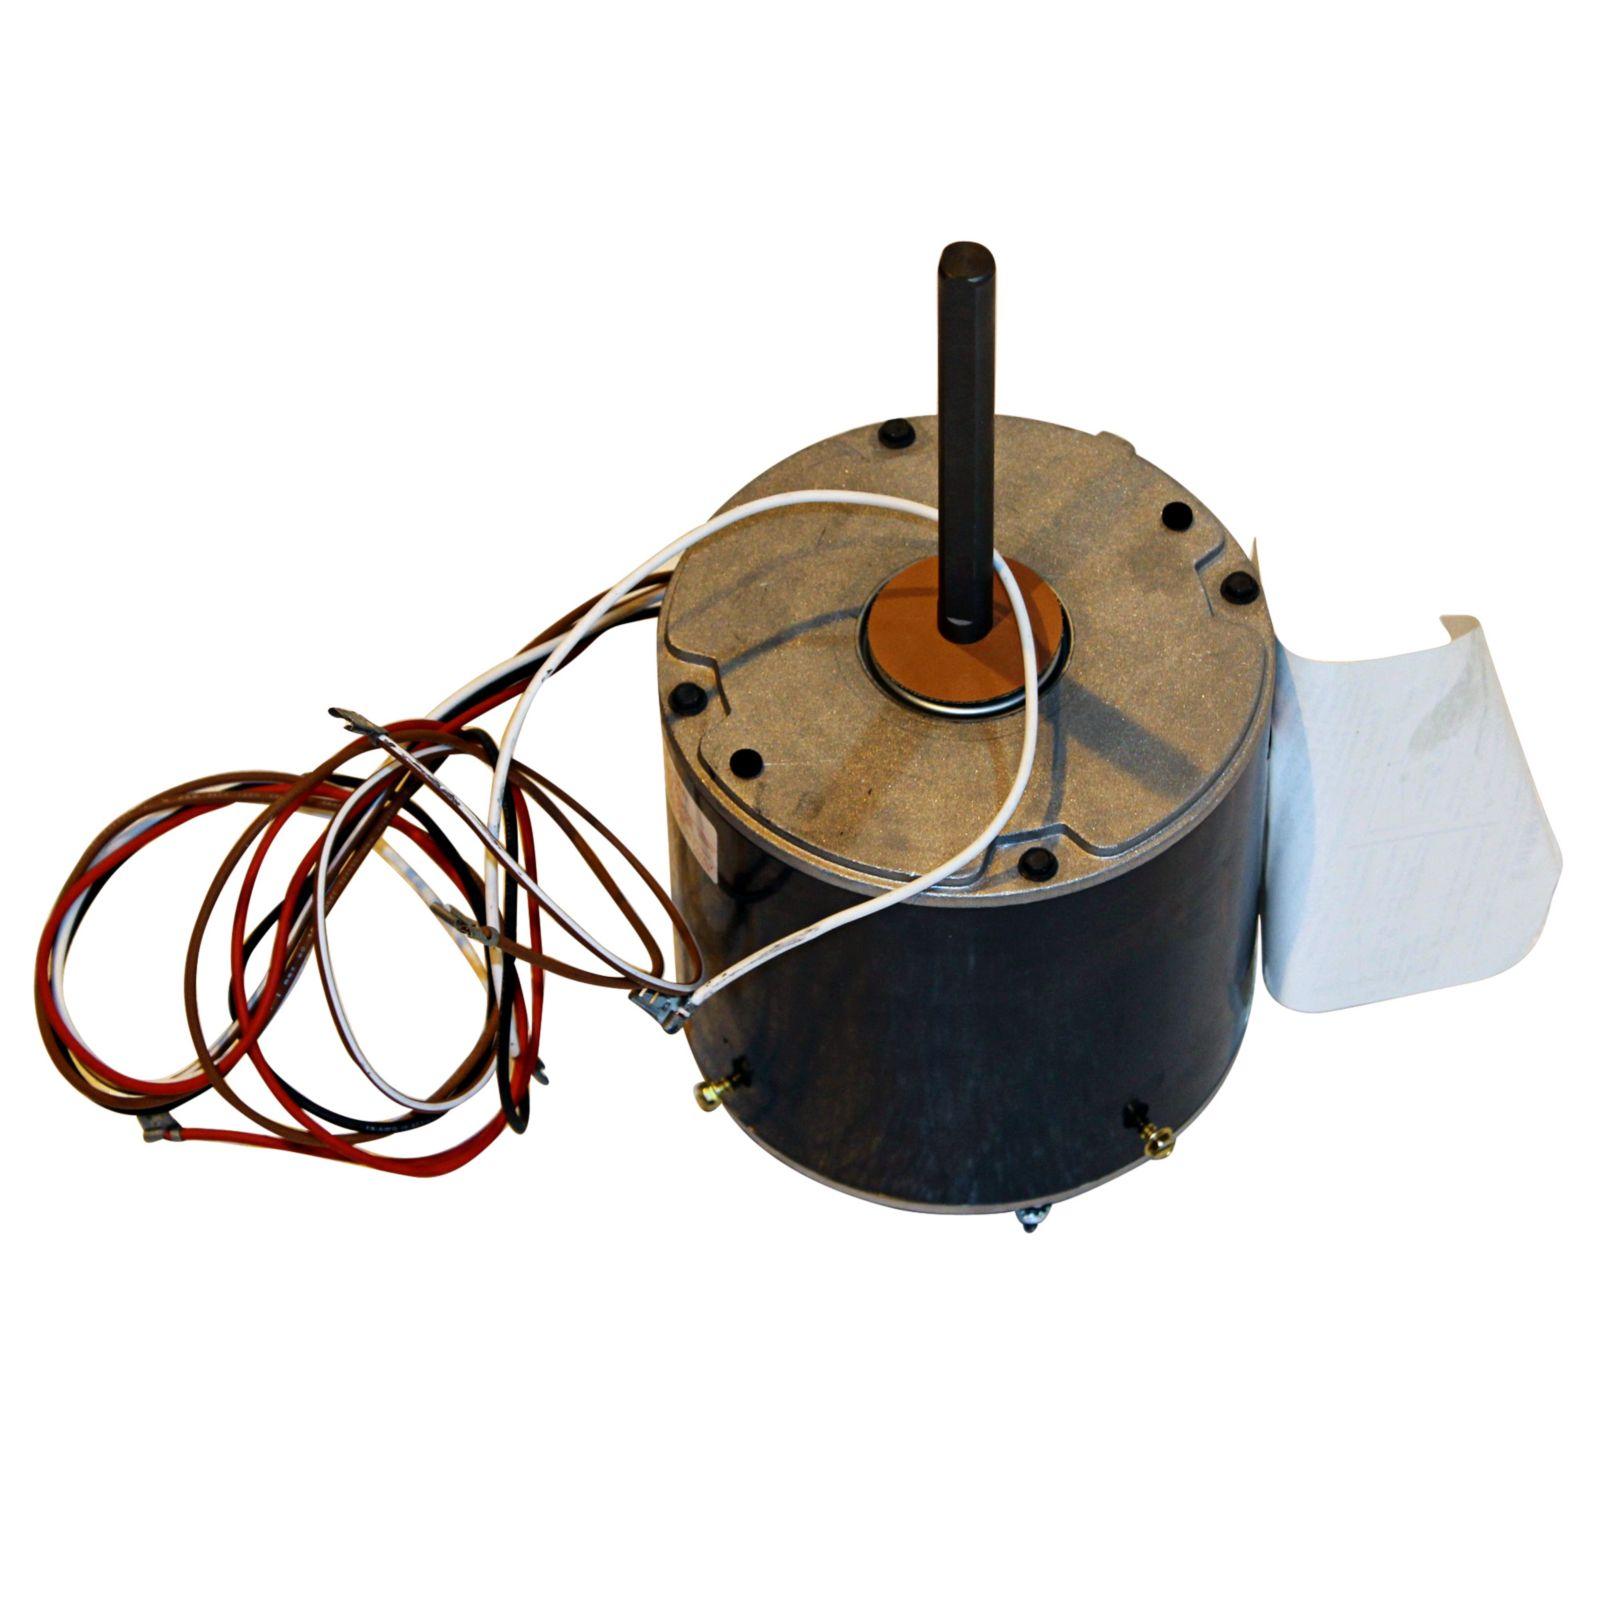 Totaline P257 E5464 Condenser Fan Motor Multi Horsepower 1 6 3 Wiring Diagrams Oem Furnace Motors Electric Hp 208 230v 255 Fla 825 Rpm 2 Speed